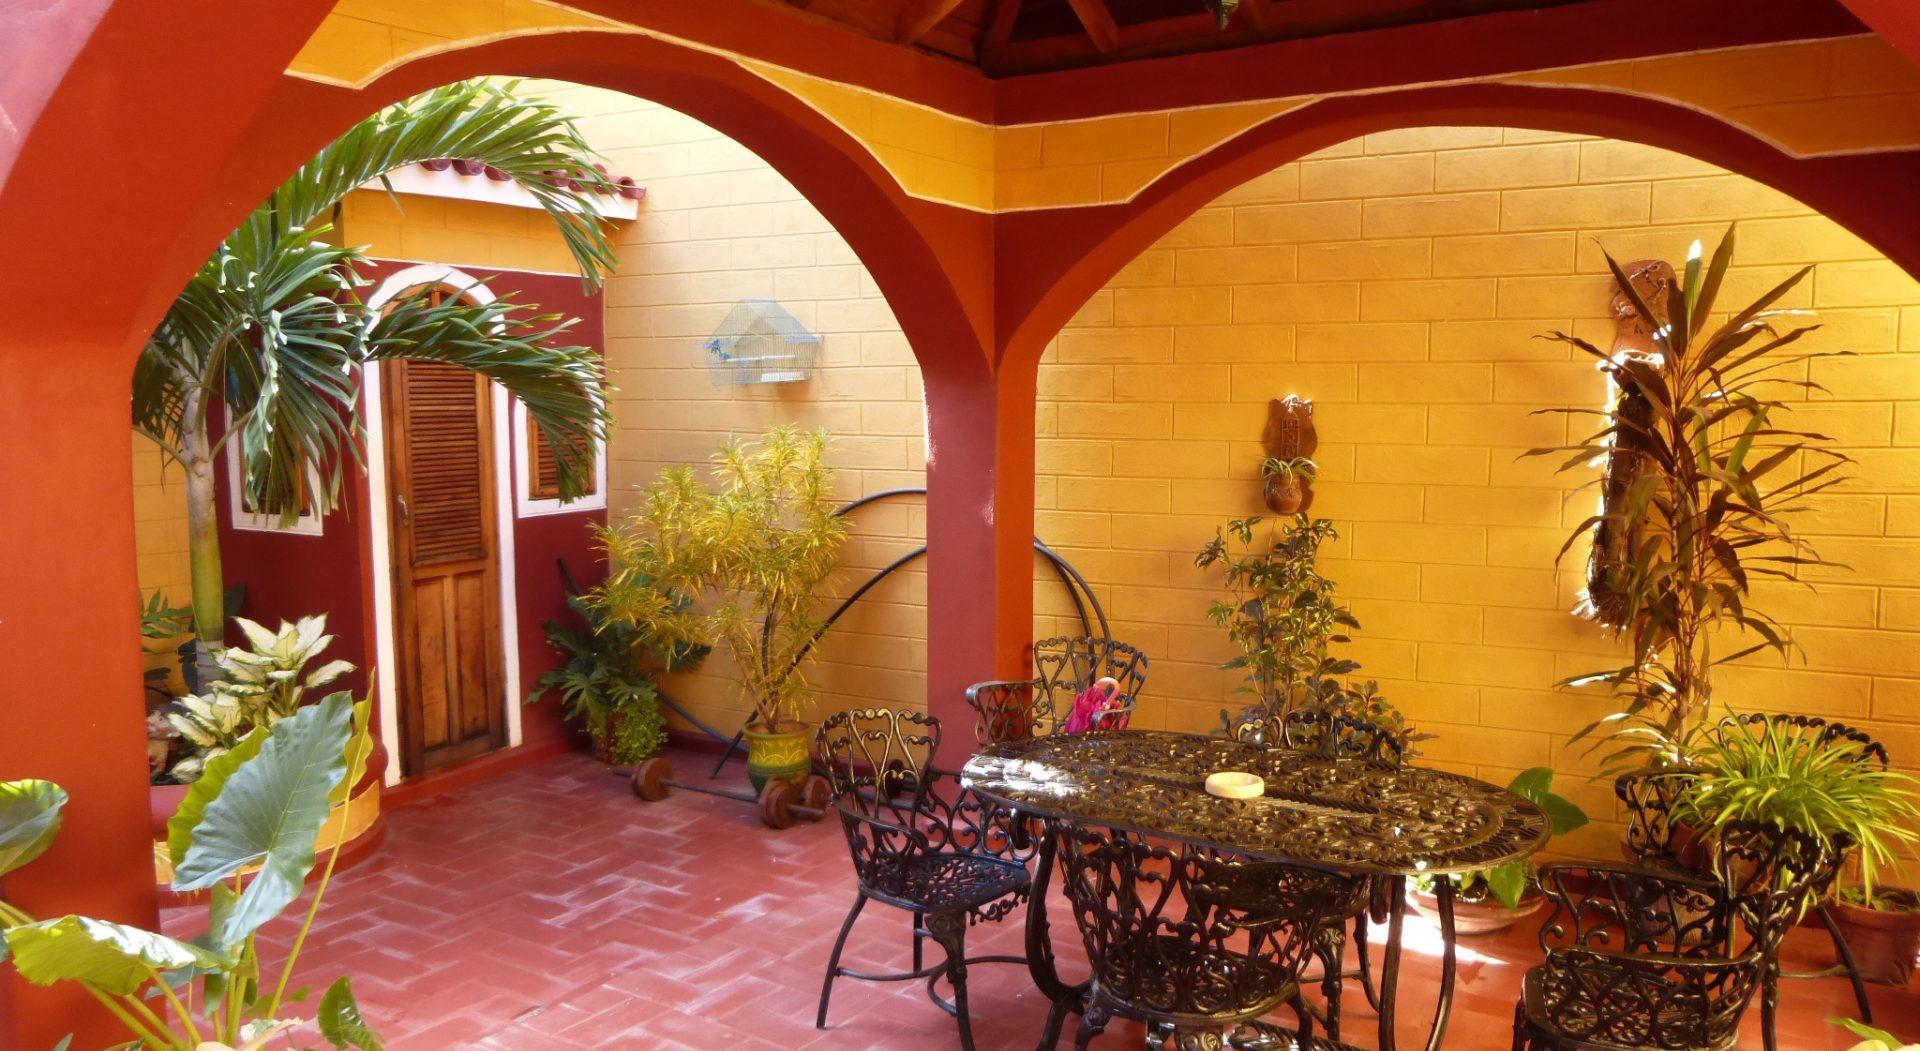 Kuba, Casa Particular, schöner Innenhof, Latin America Tours, Reisen